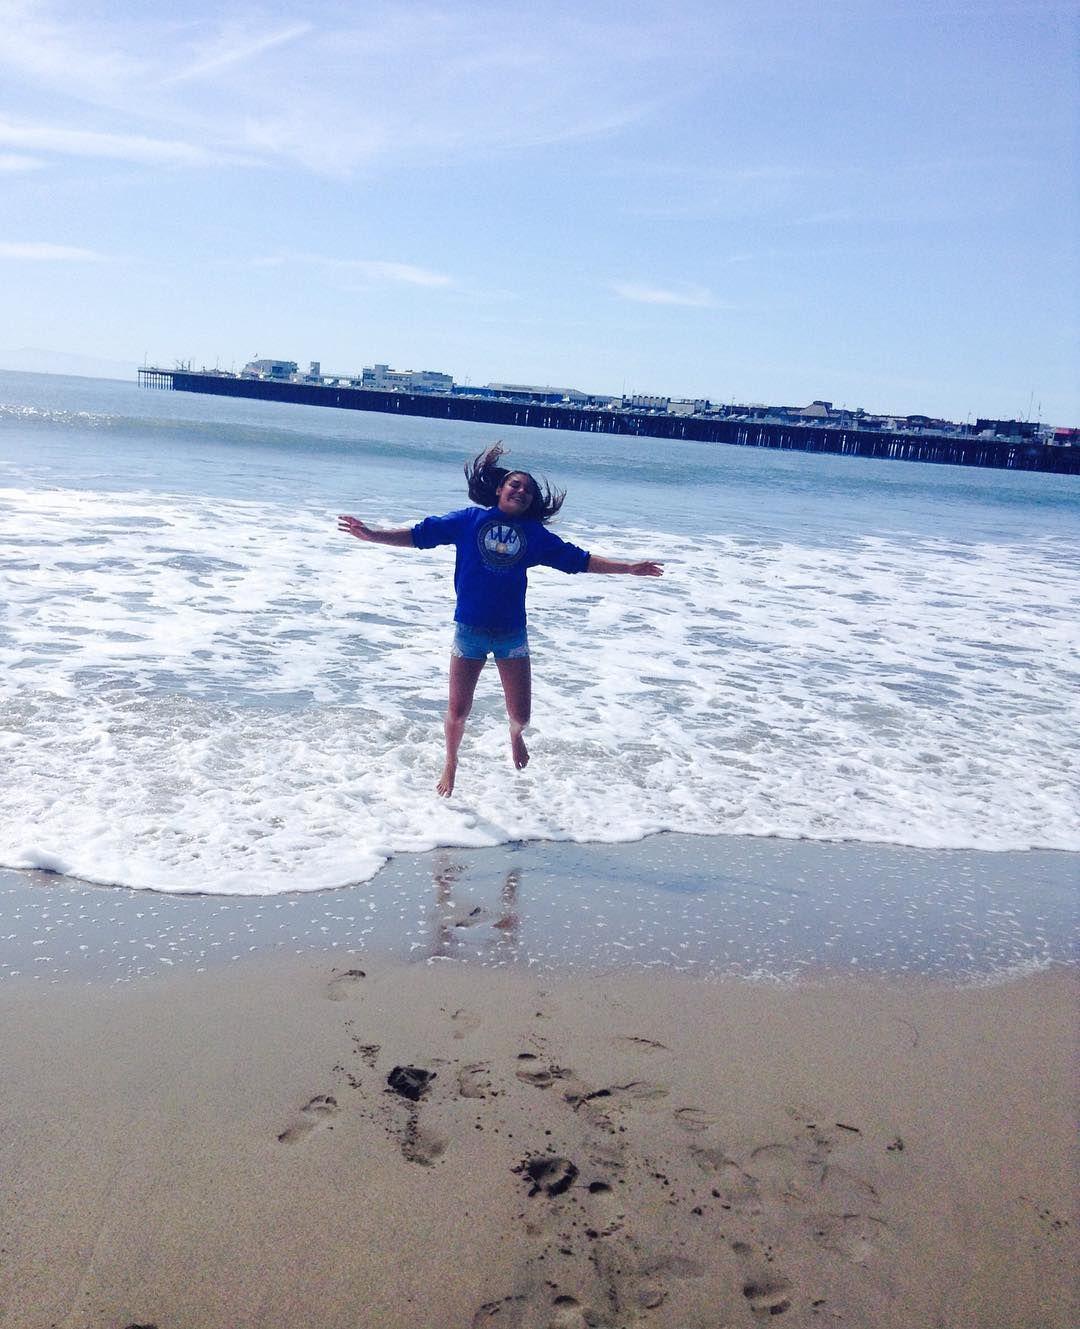 Santa Cruz CA: S A N T A  C R U Z  CALIFORNIA by jadenswims